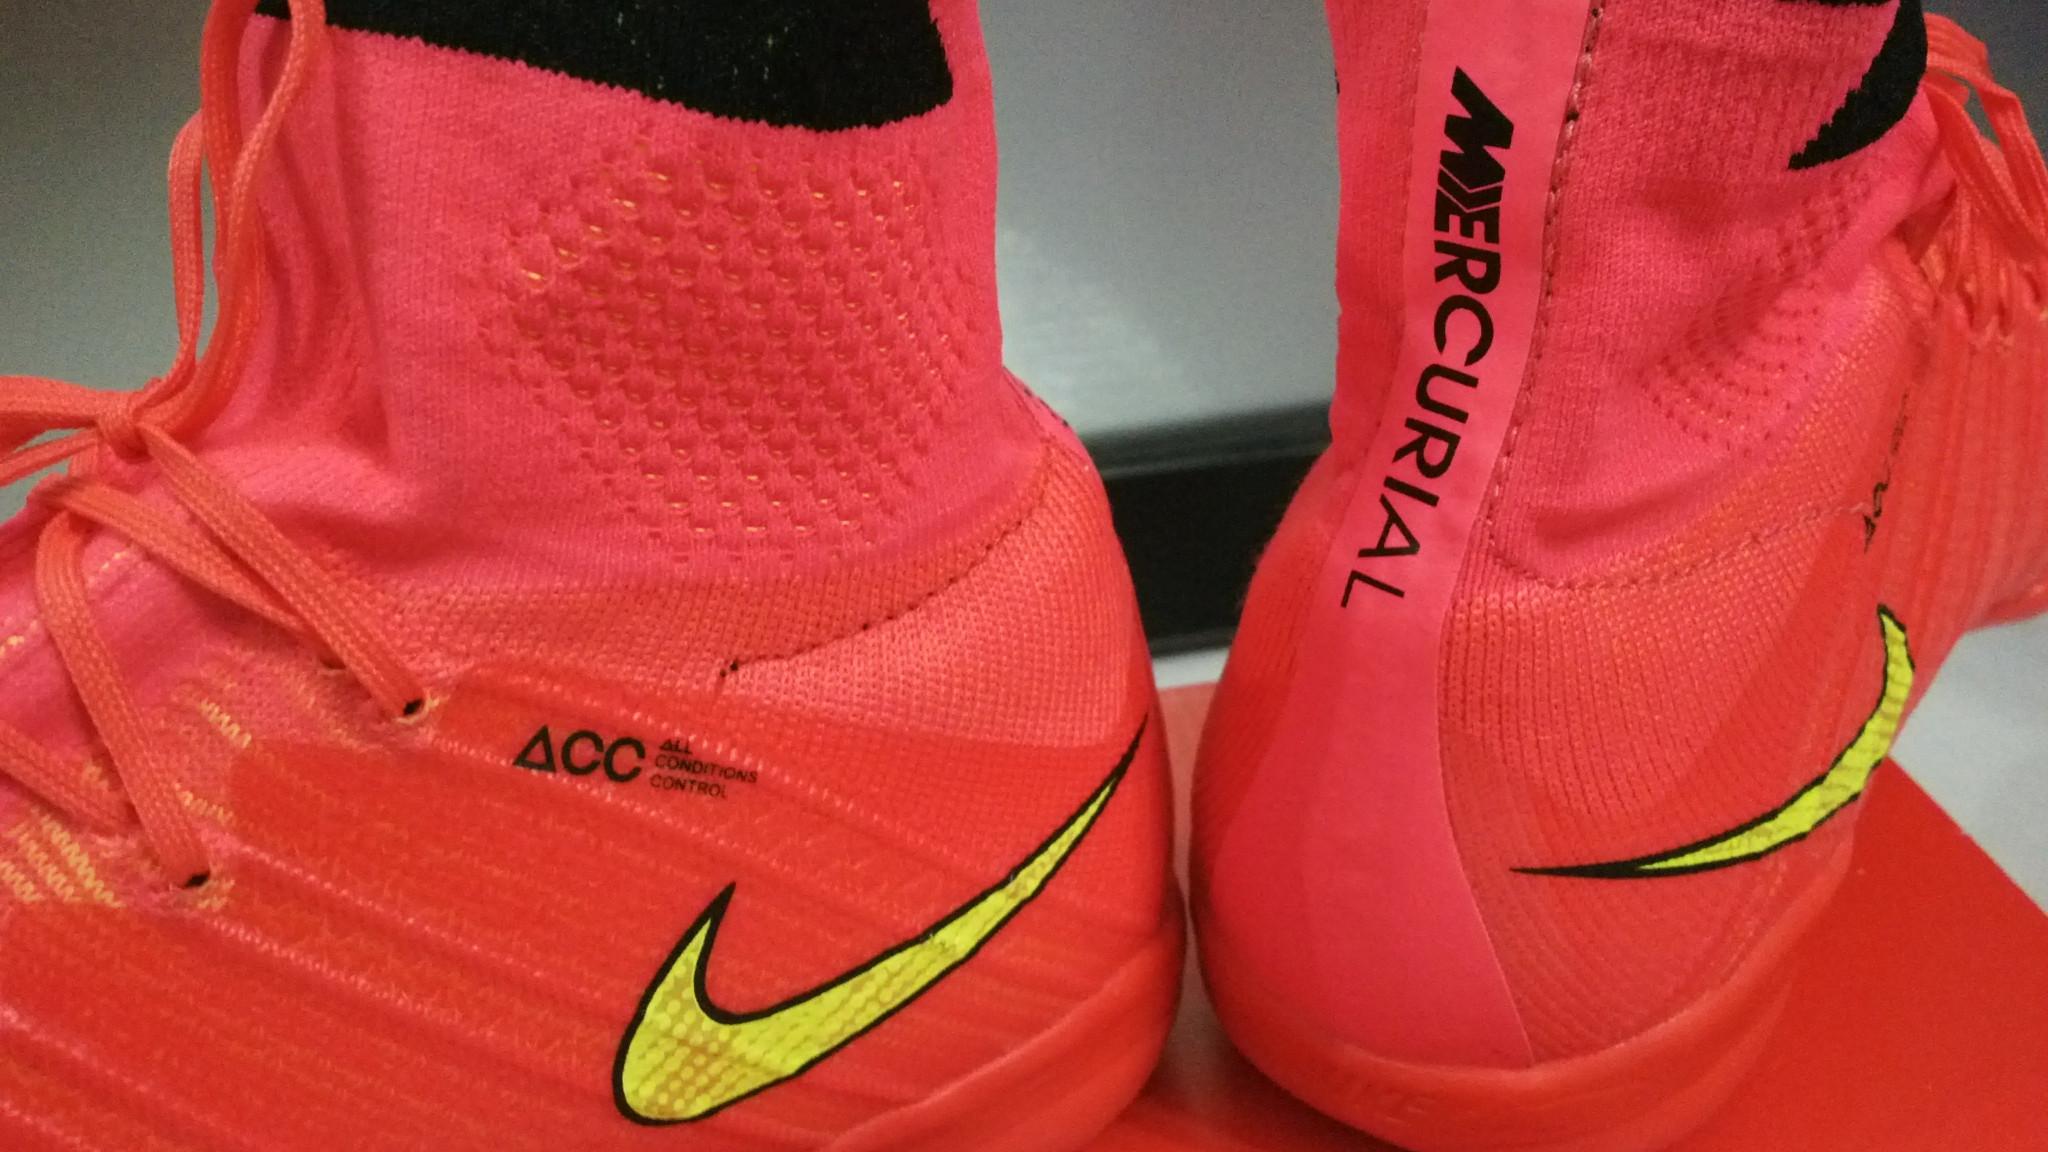 Jual Nike Mercurial Superfly Red [Sepatu Futsal] [G.O